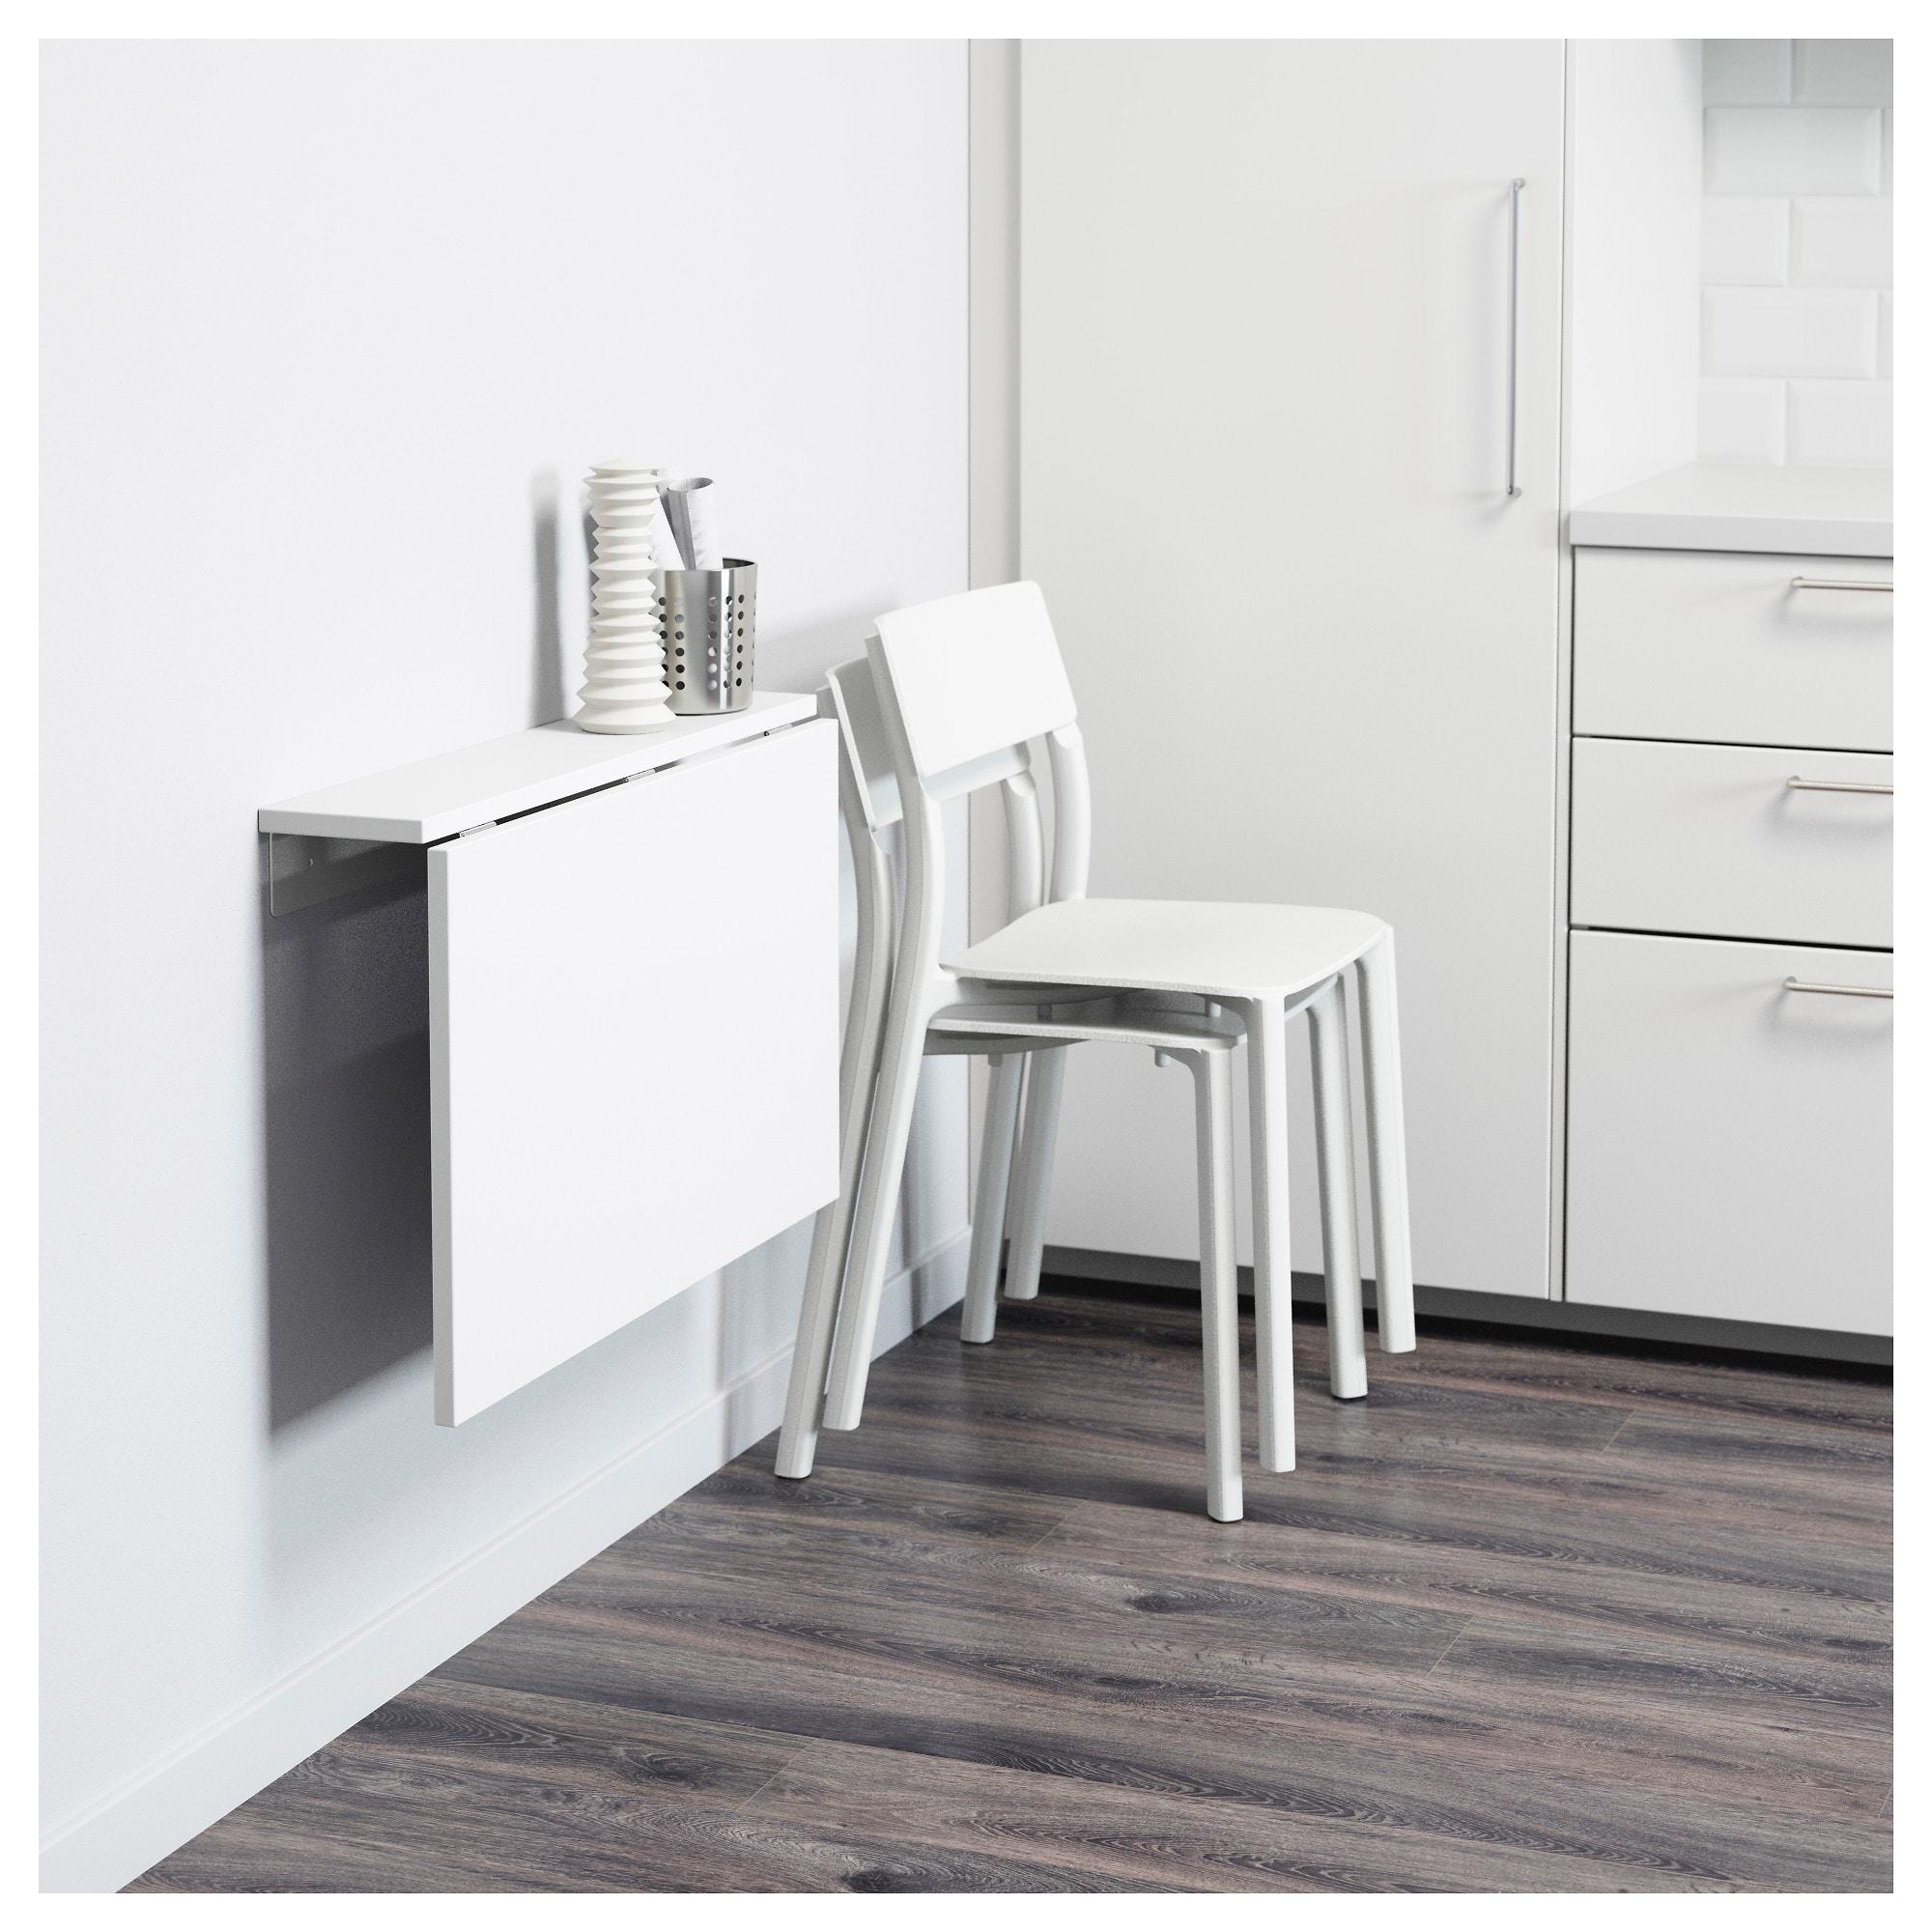 Mesas De Cocina Plegables Ikea D0dg norberg Mesa Abatible De Pared Blanco 74 X 60 Cm Ikea